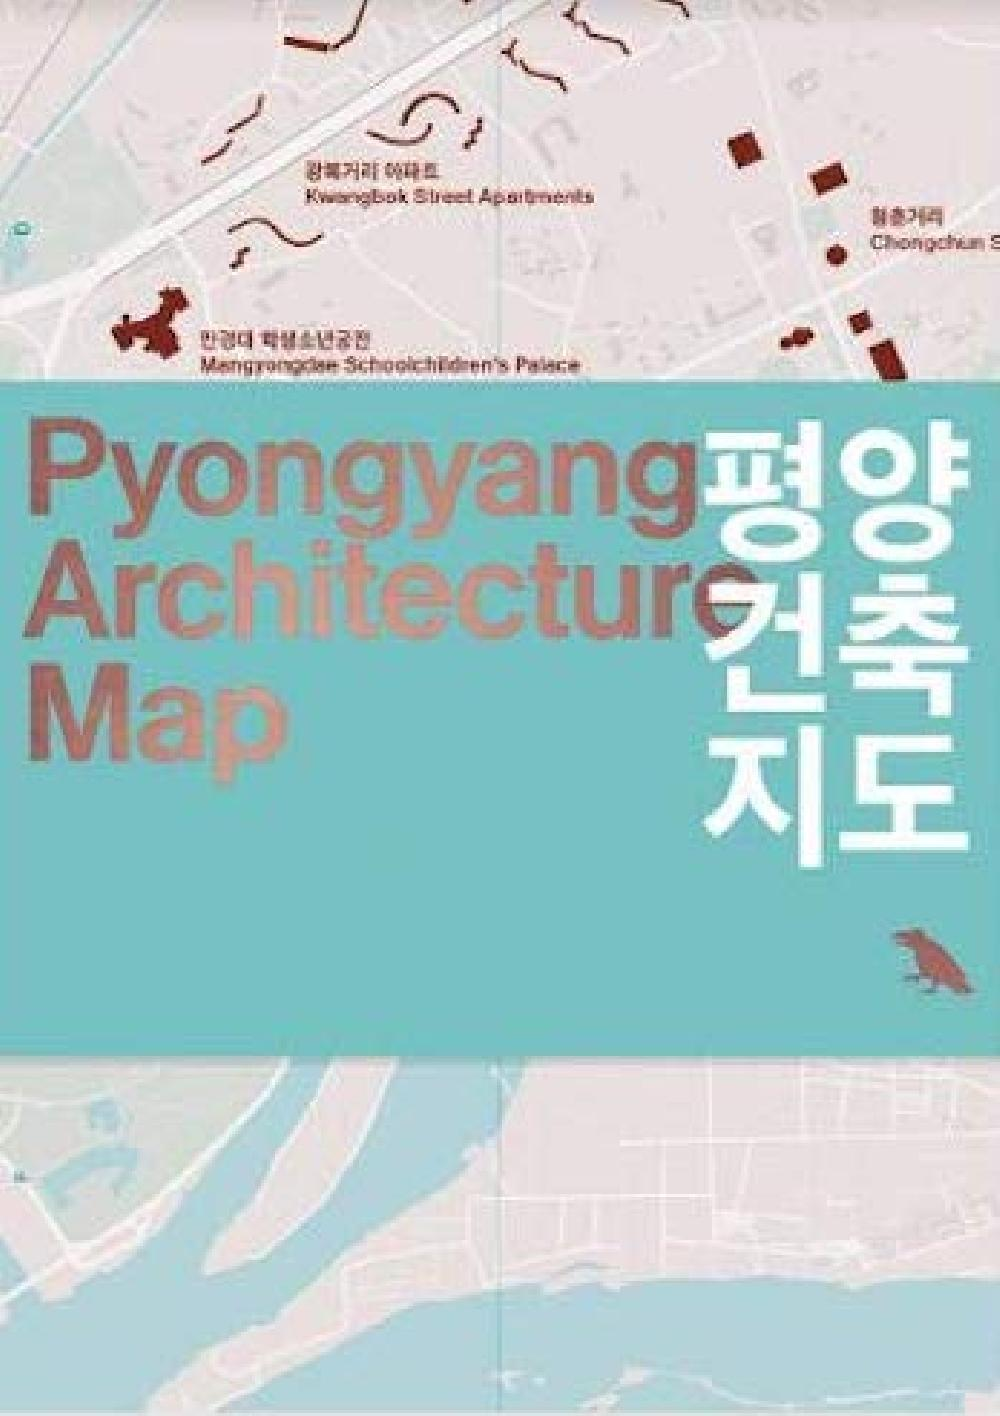 Pyongyang Architecture Map